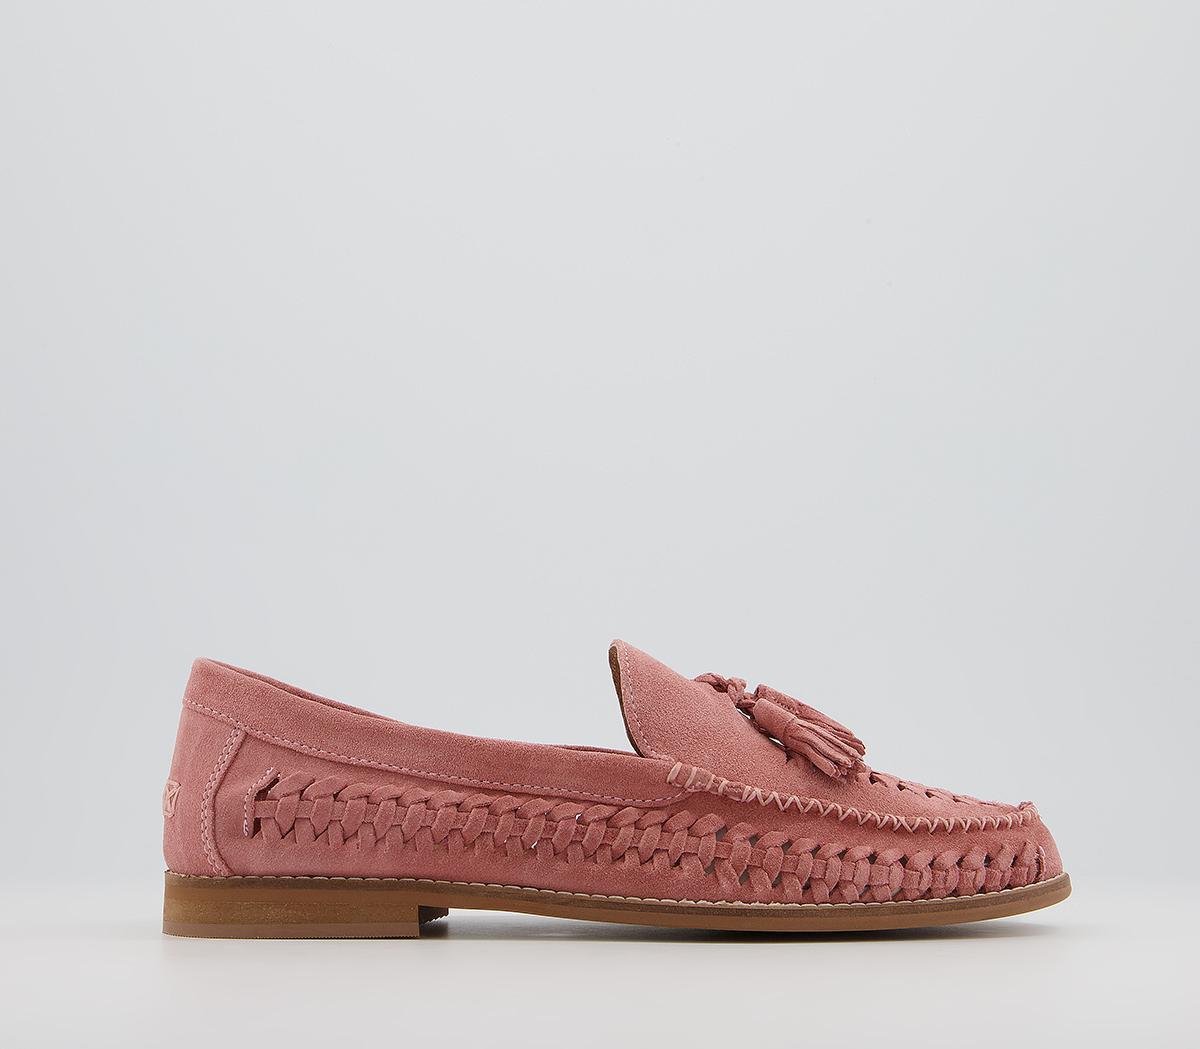 Clapton Woven Tassel Loafers